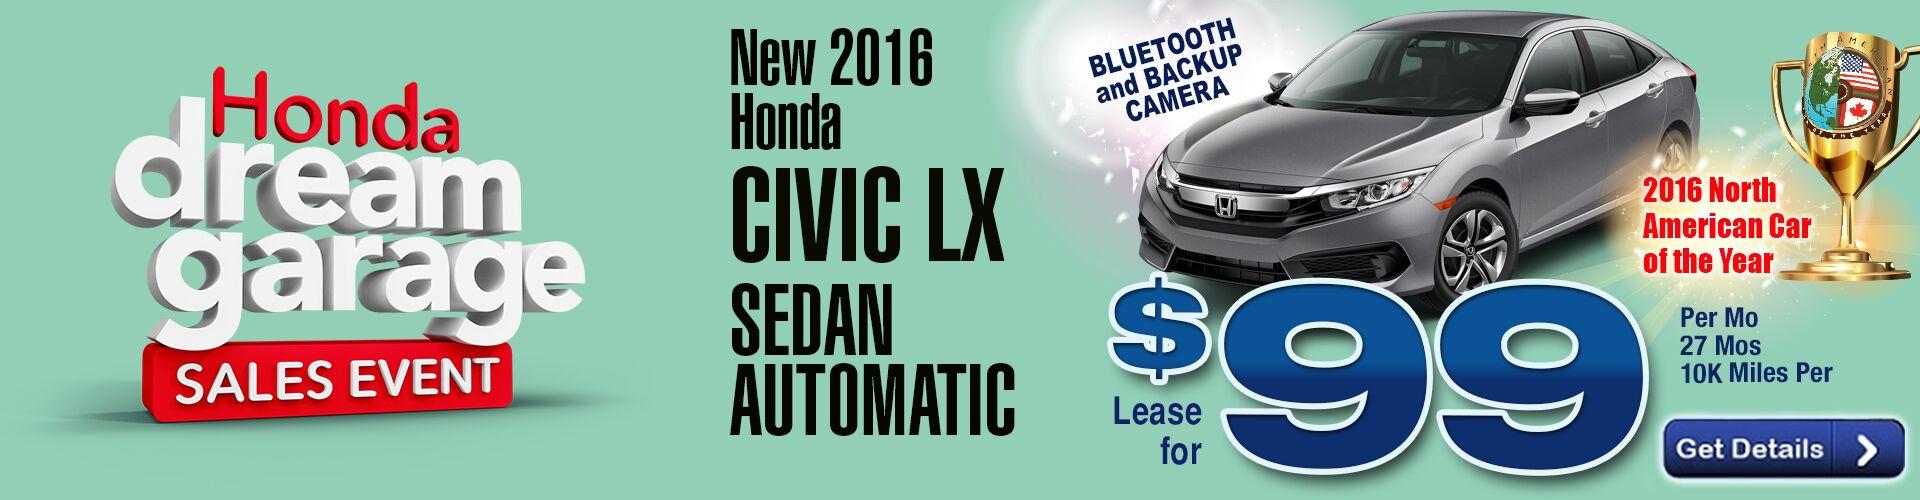 Honda lease deals clifton nj lamoureph blog for Honda dealership paramus nj